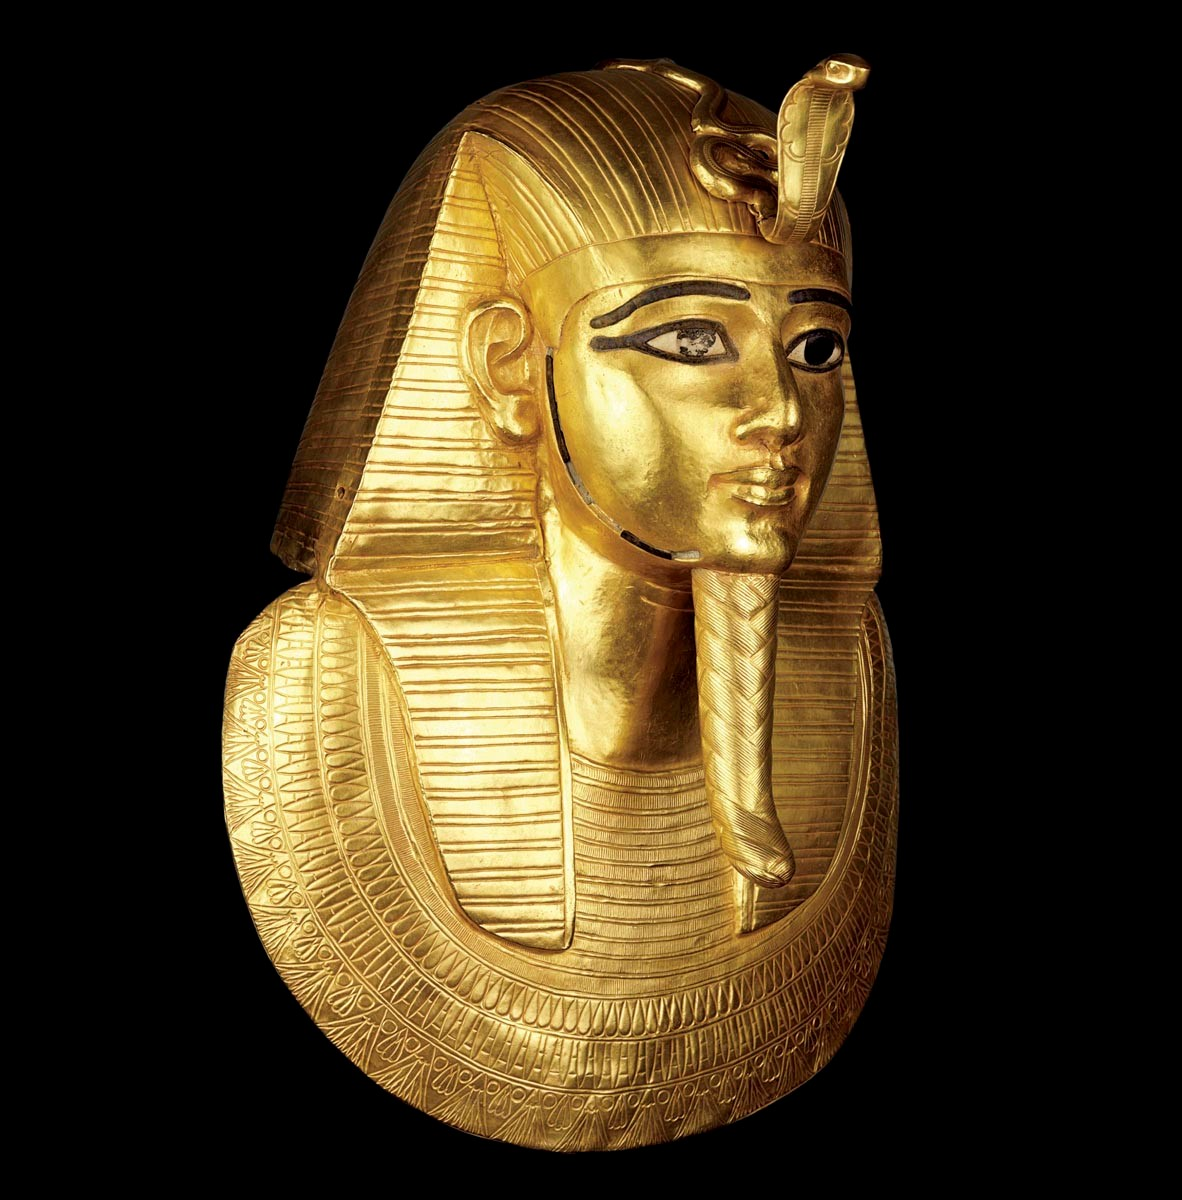 The Golden King and the Great Pharaohs Tutankhamun